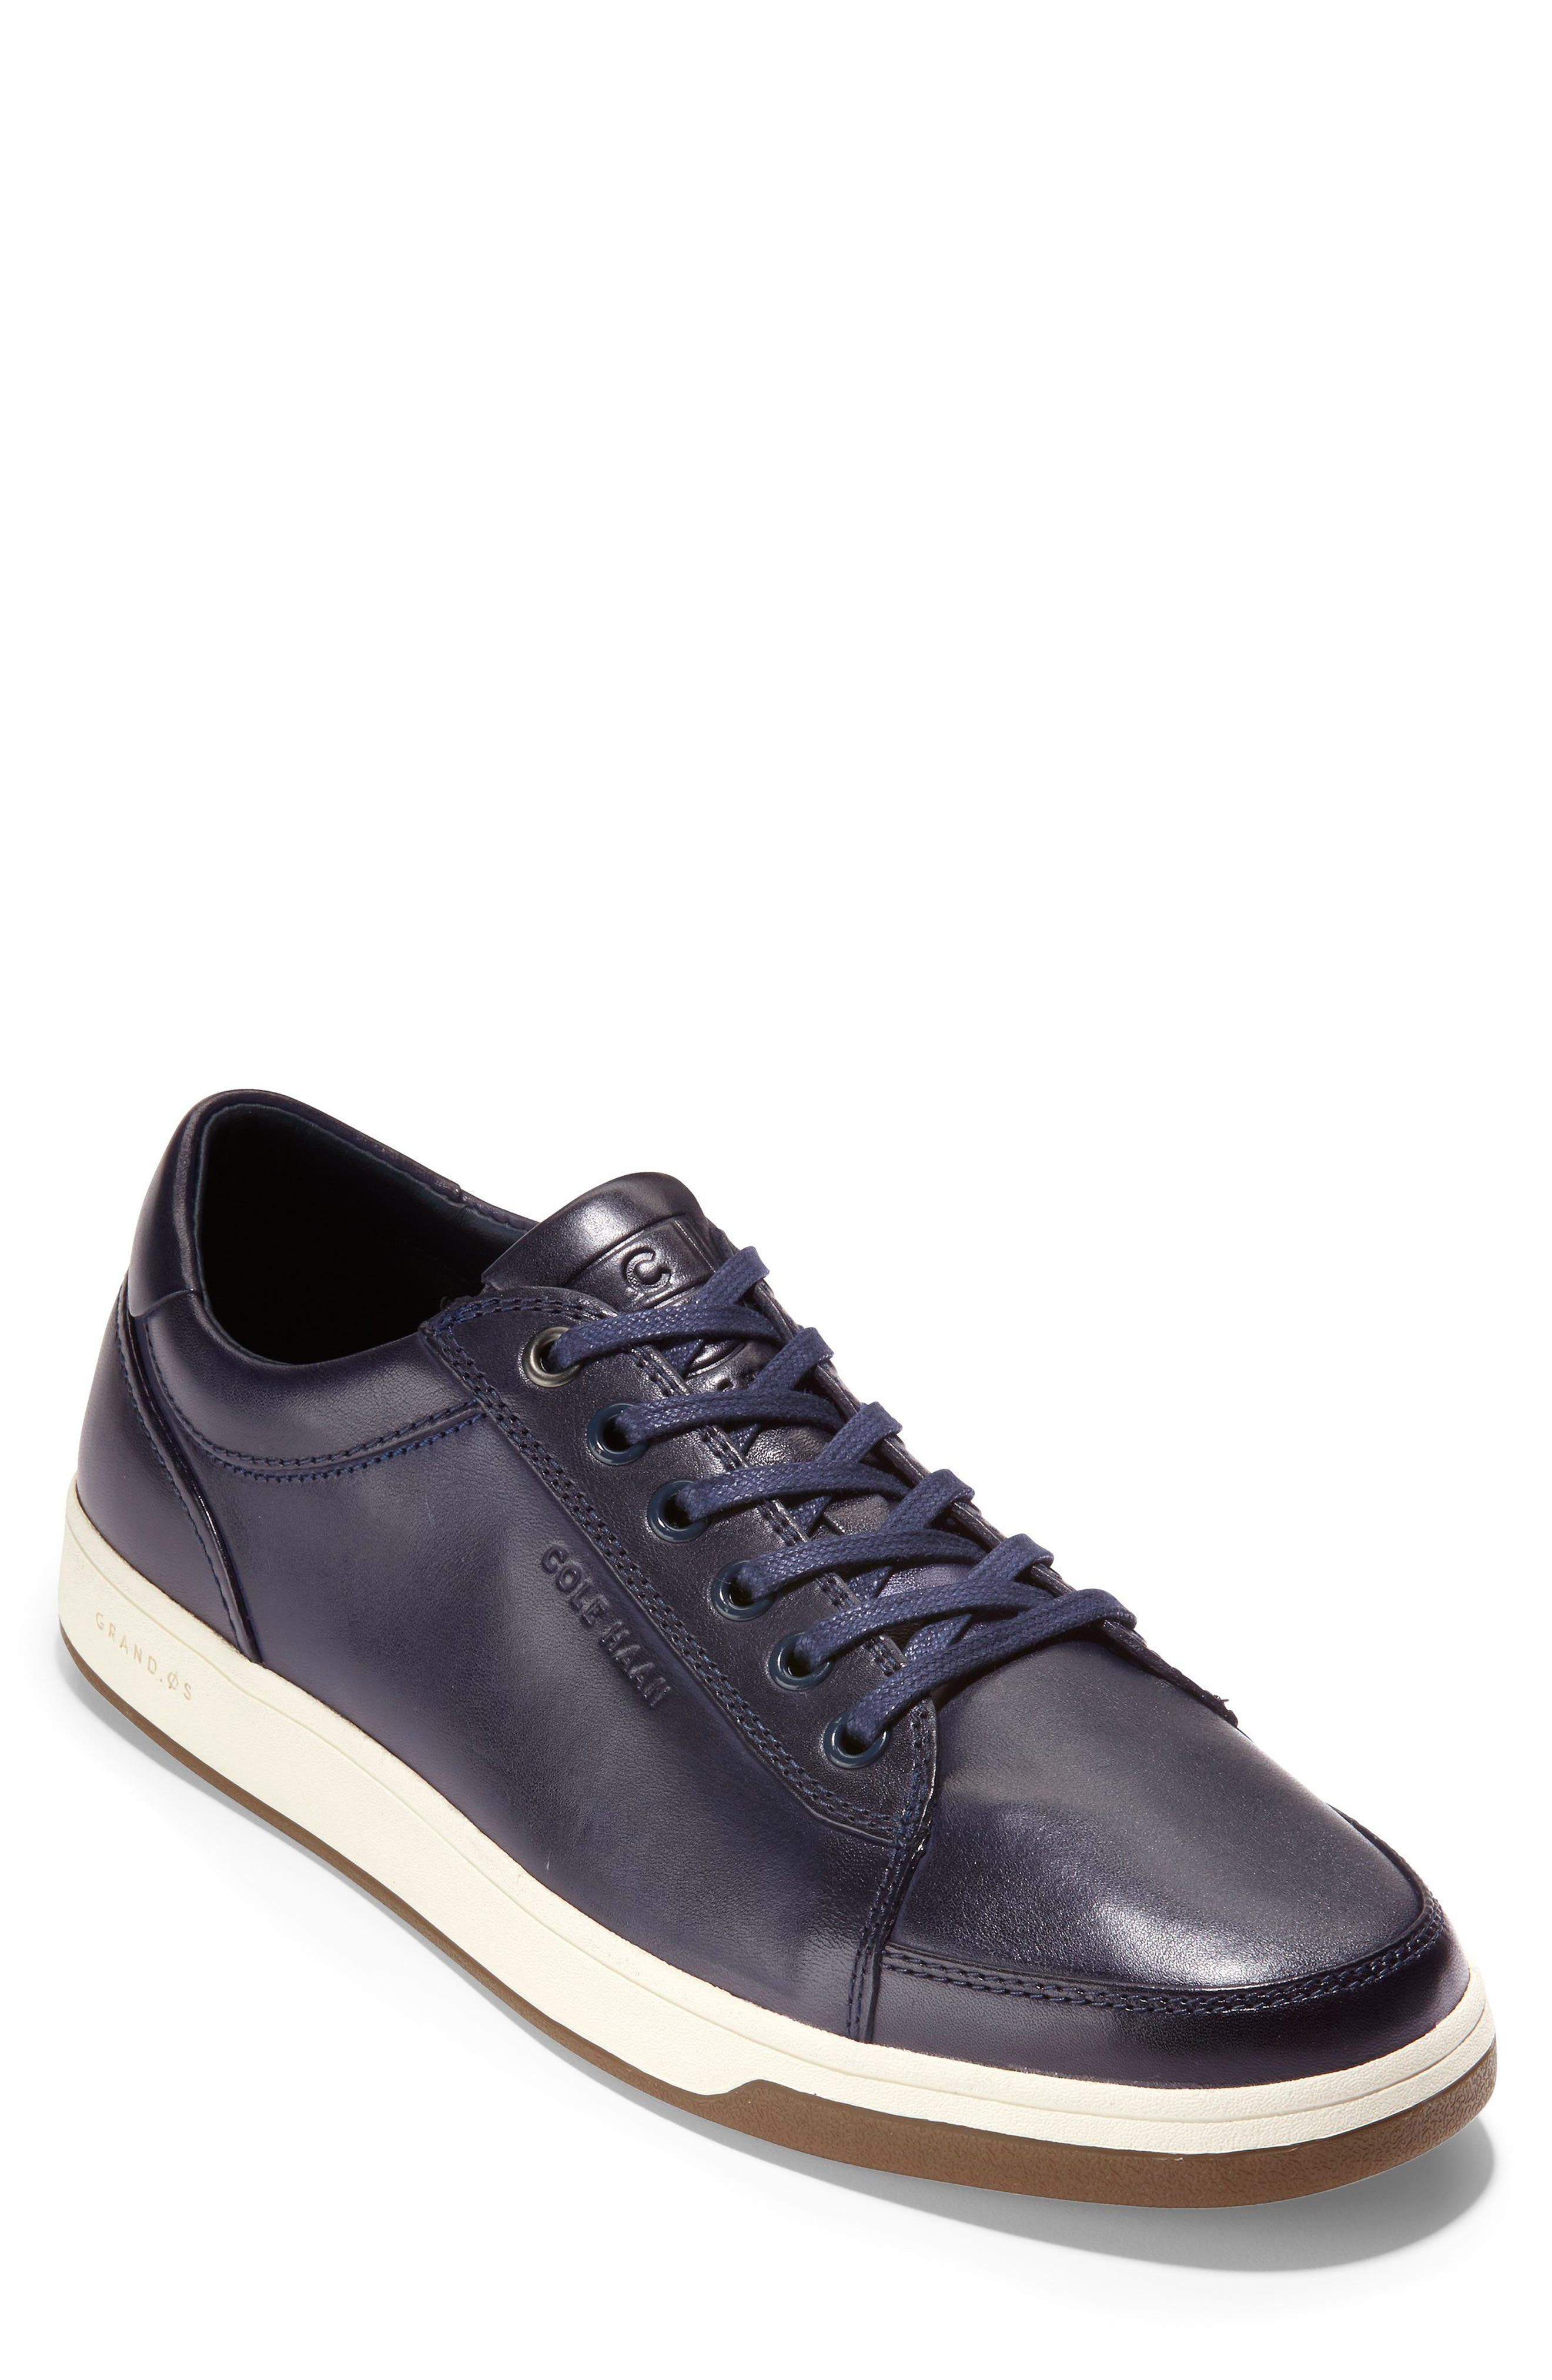 GrandPro Spectator Sneaker,                             Main thumbnail 1, color,                             Blazer Blue Handstain Leather